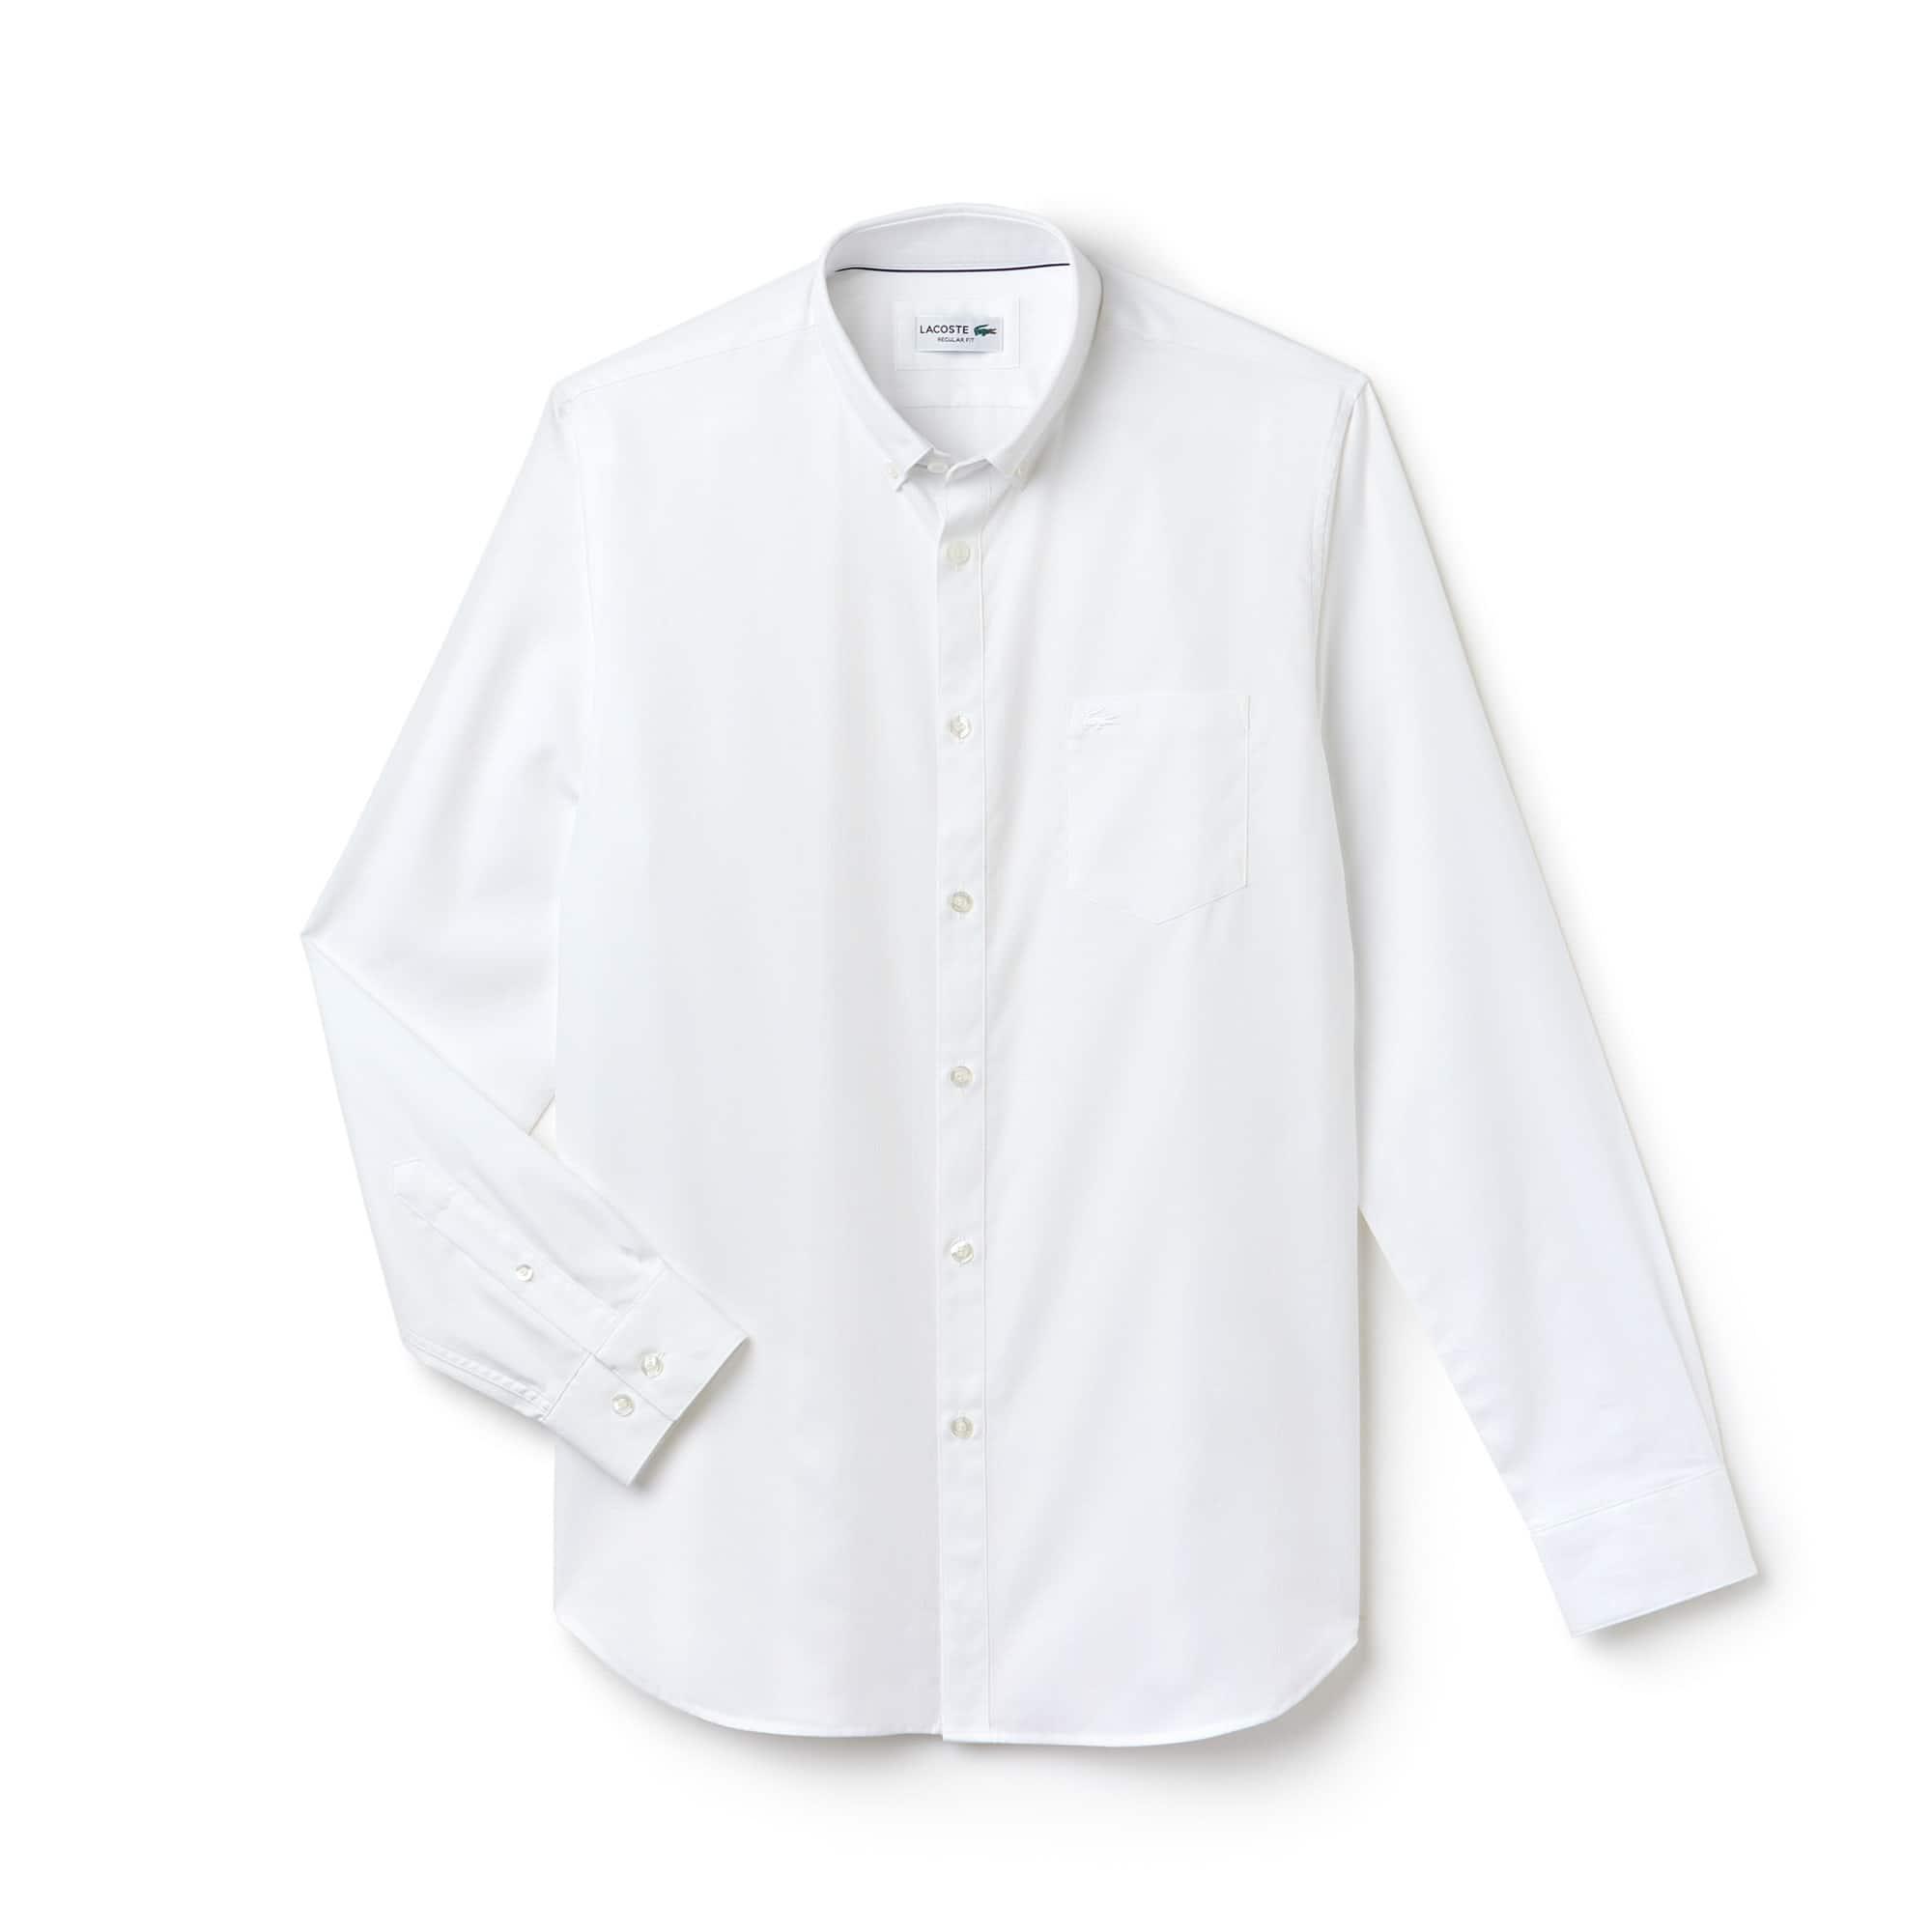 Lacoste - Regular Fit Herren-Hemd aus strukturierter Popeline - 4